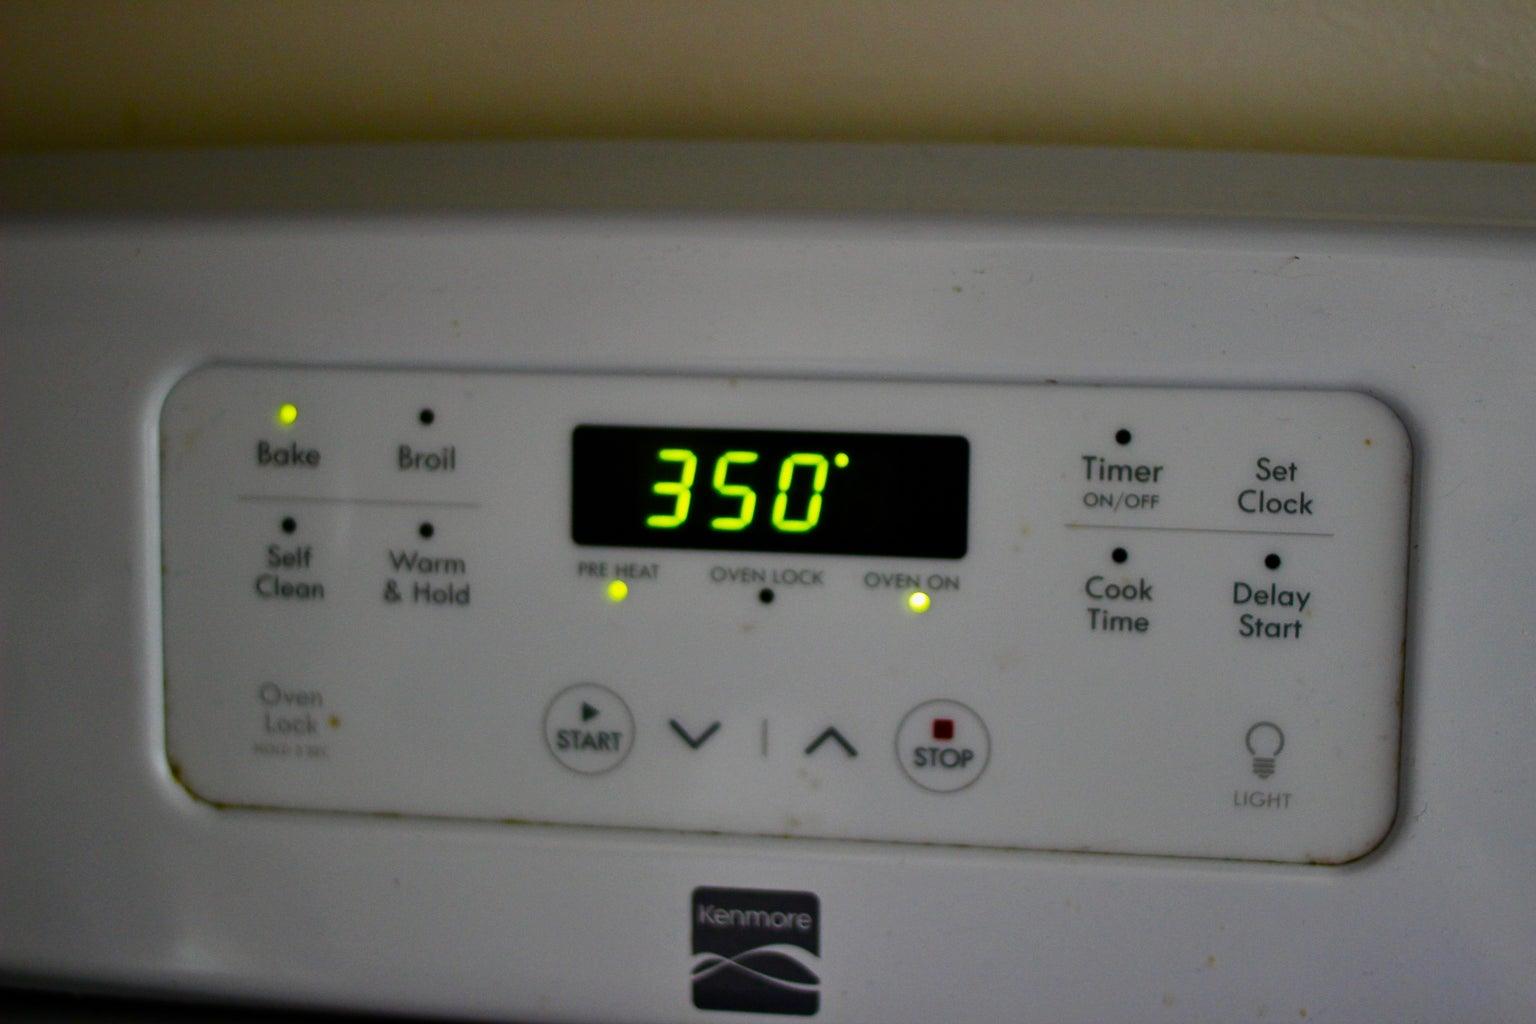 Preheat Oven to 350F